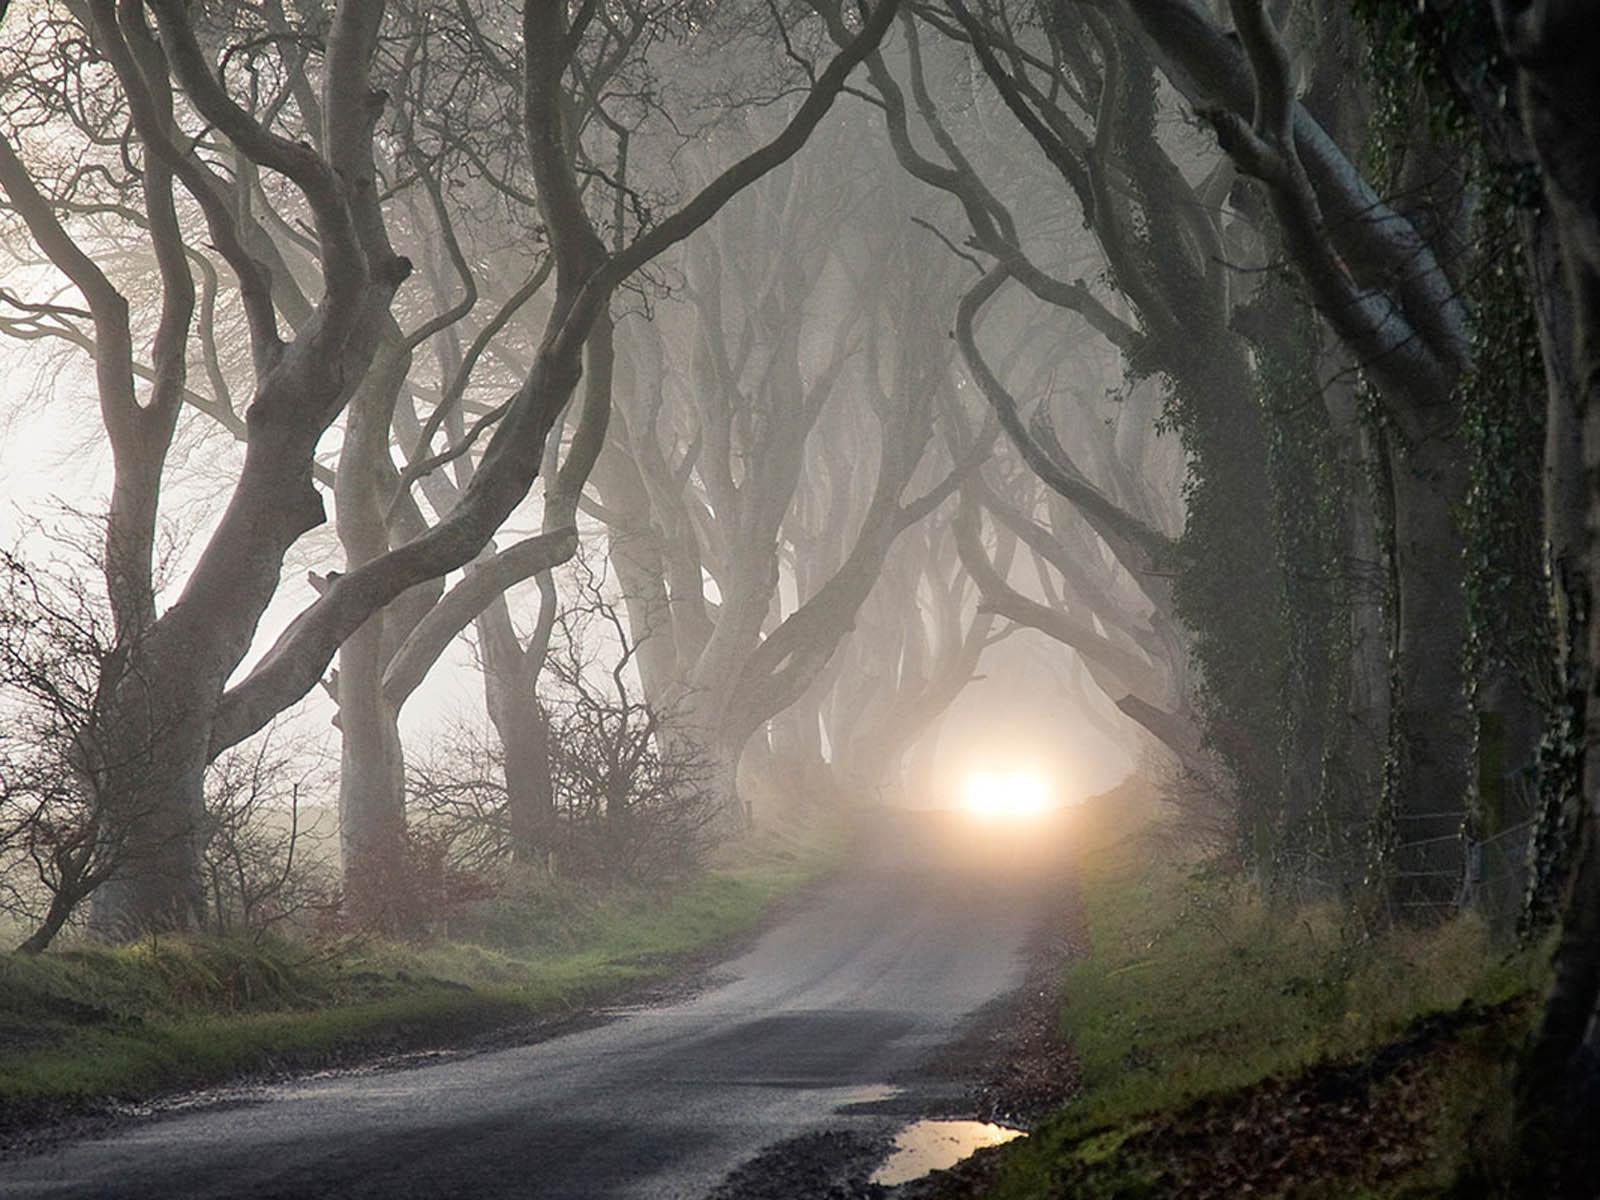 Wallpaper twilight forest - Twilight wallpaper ...